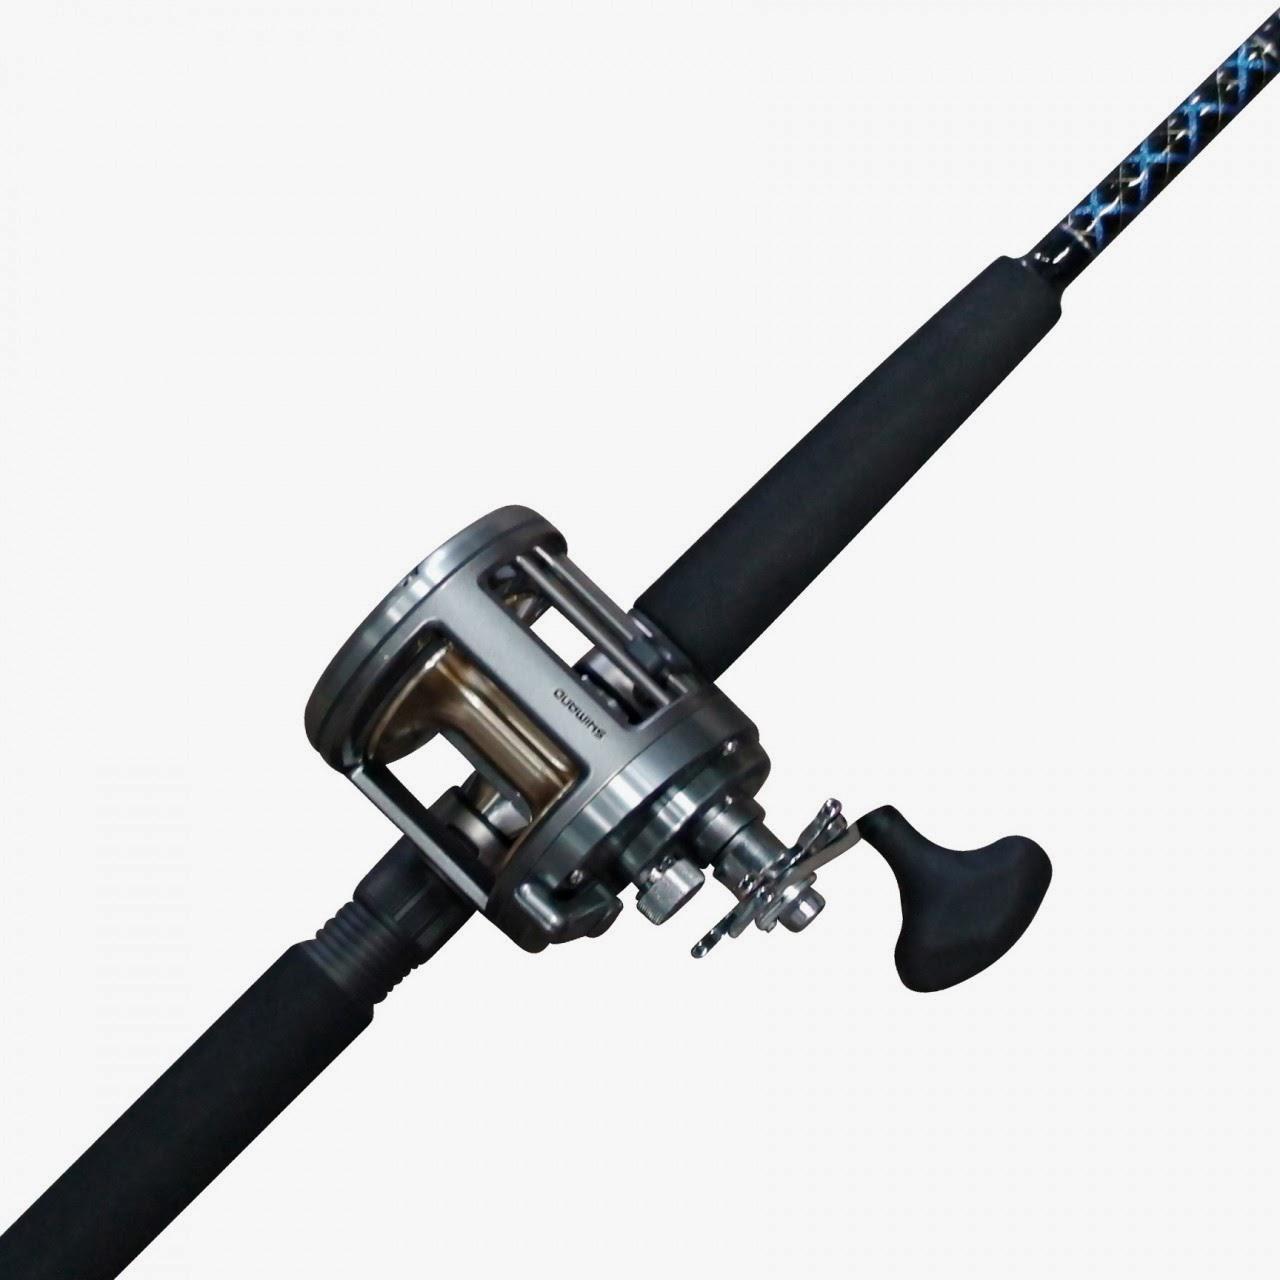 Shimano-Tekota-700-with-Ugly-Stick-6-Foot-Fishing-Rod